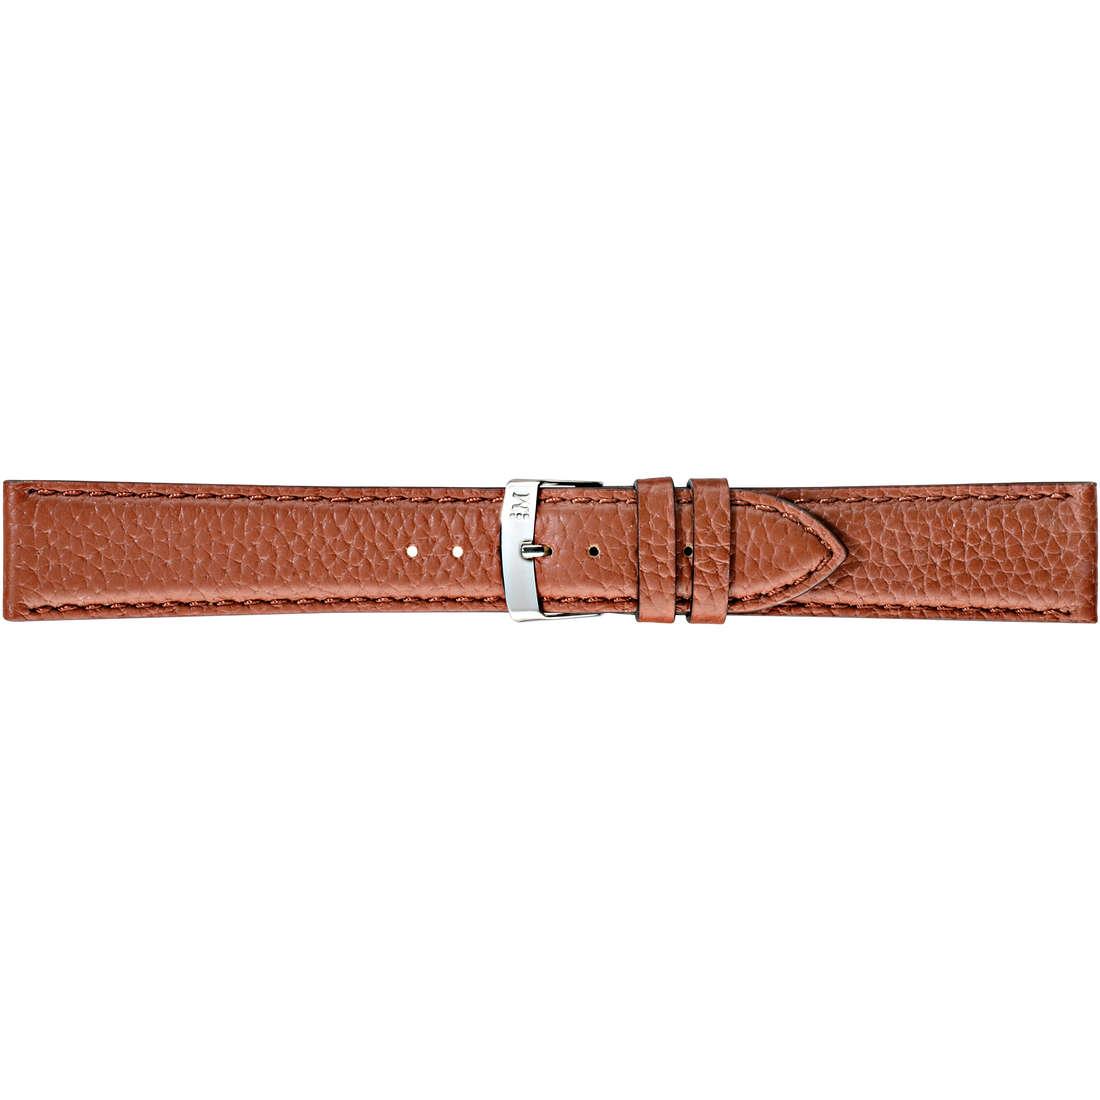 watch watch bands watch straps man Morellato Performance A01X4596B61041CR22